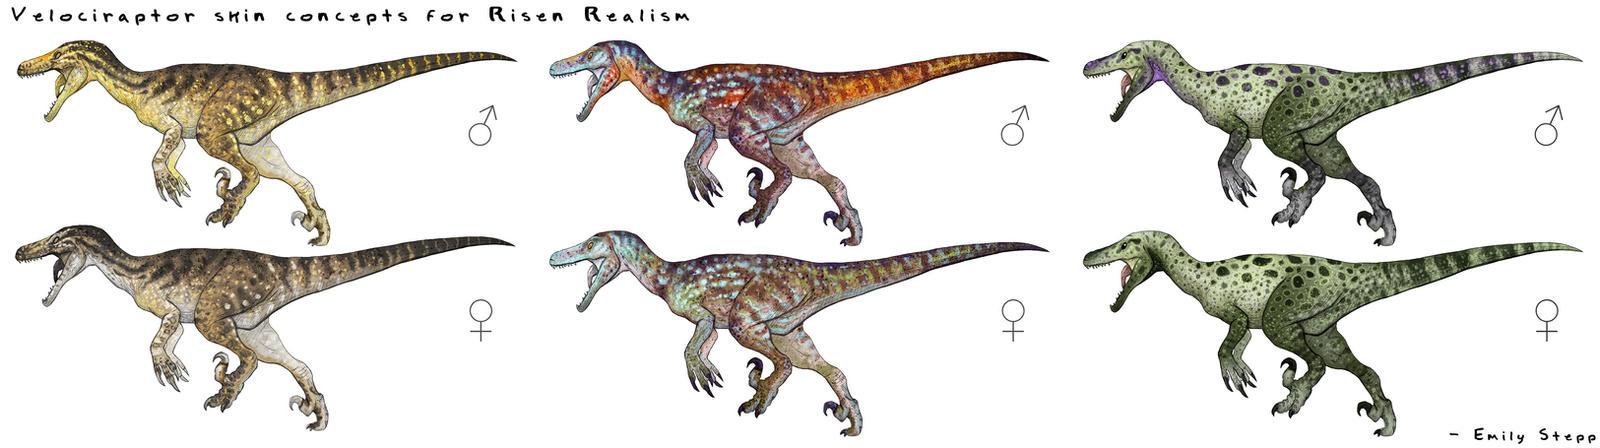 Velociraptor Skin Concepts by EmilyStepp